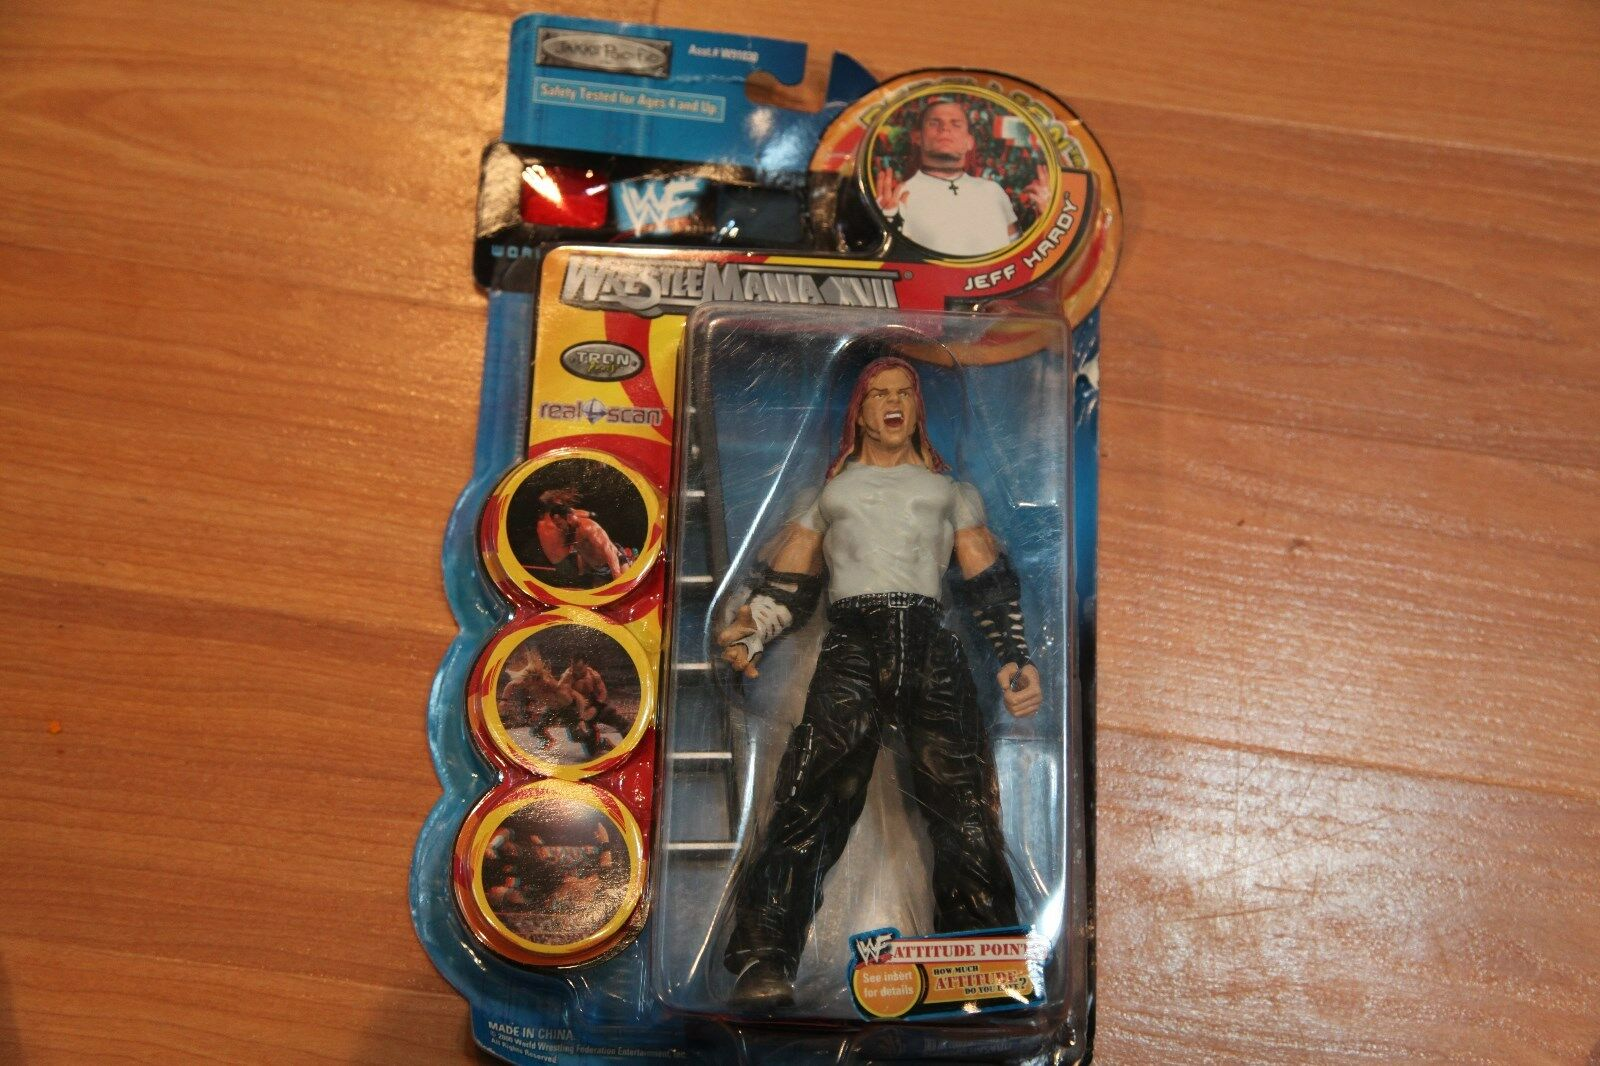 WWE WWF WWF WWE Jakks JEFF HARDY Action Figure Wrestlemania XVII Rebellion FREE SHIPPING 7a1177